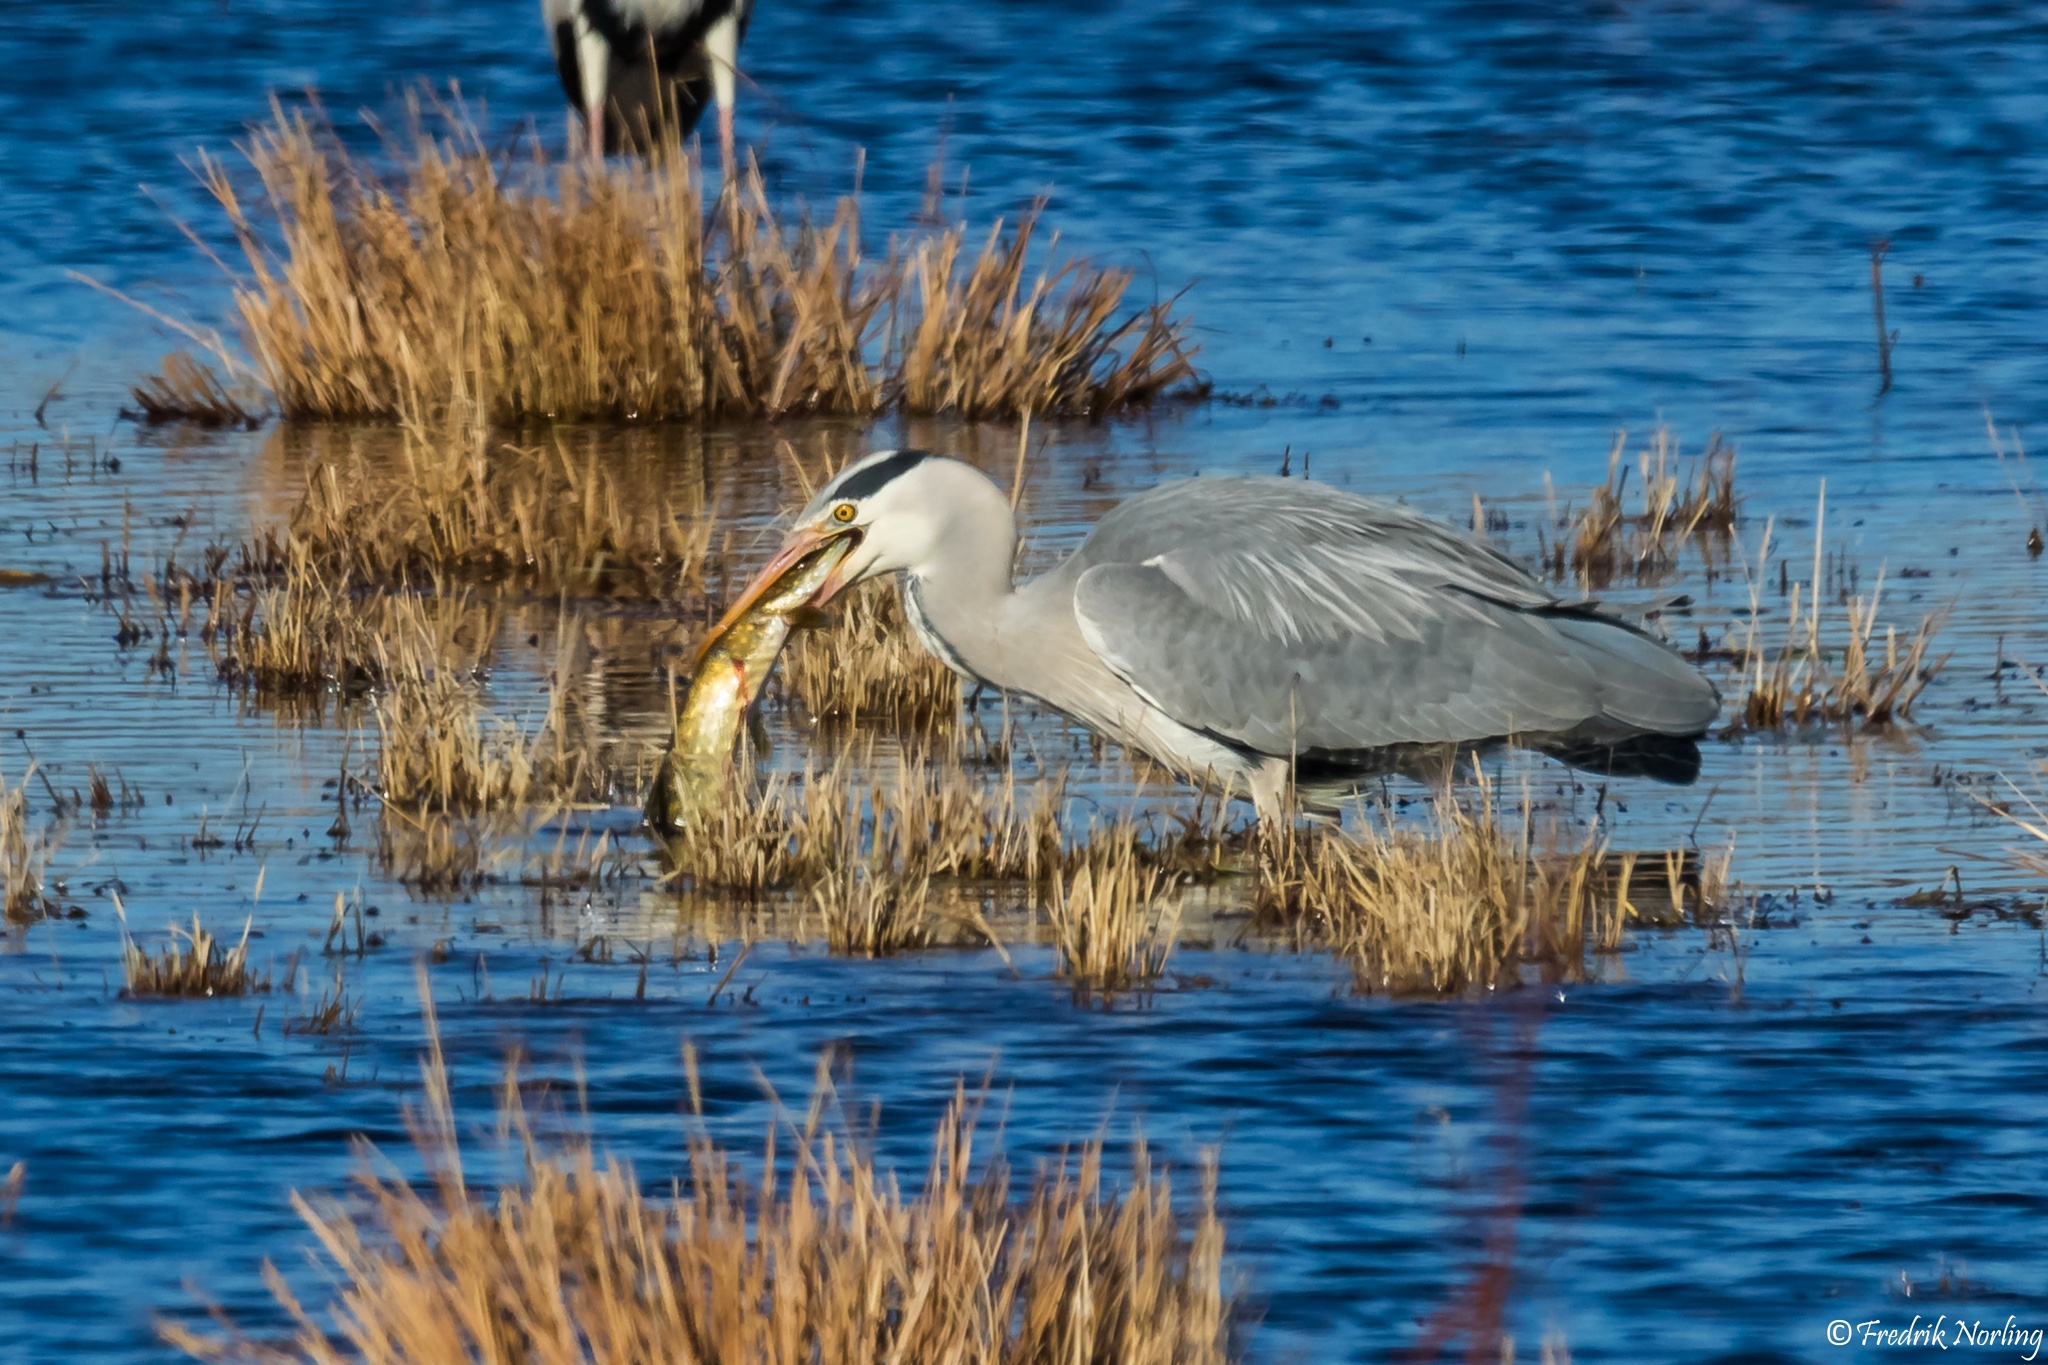 Heron eats Northern Pike by Fredrik Norling